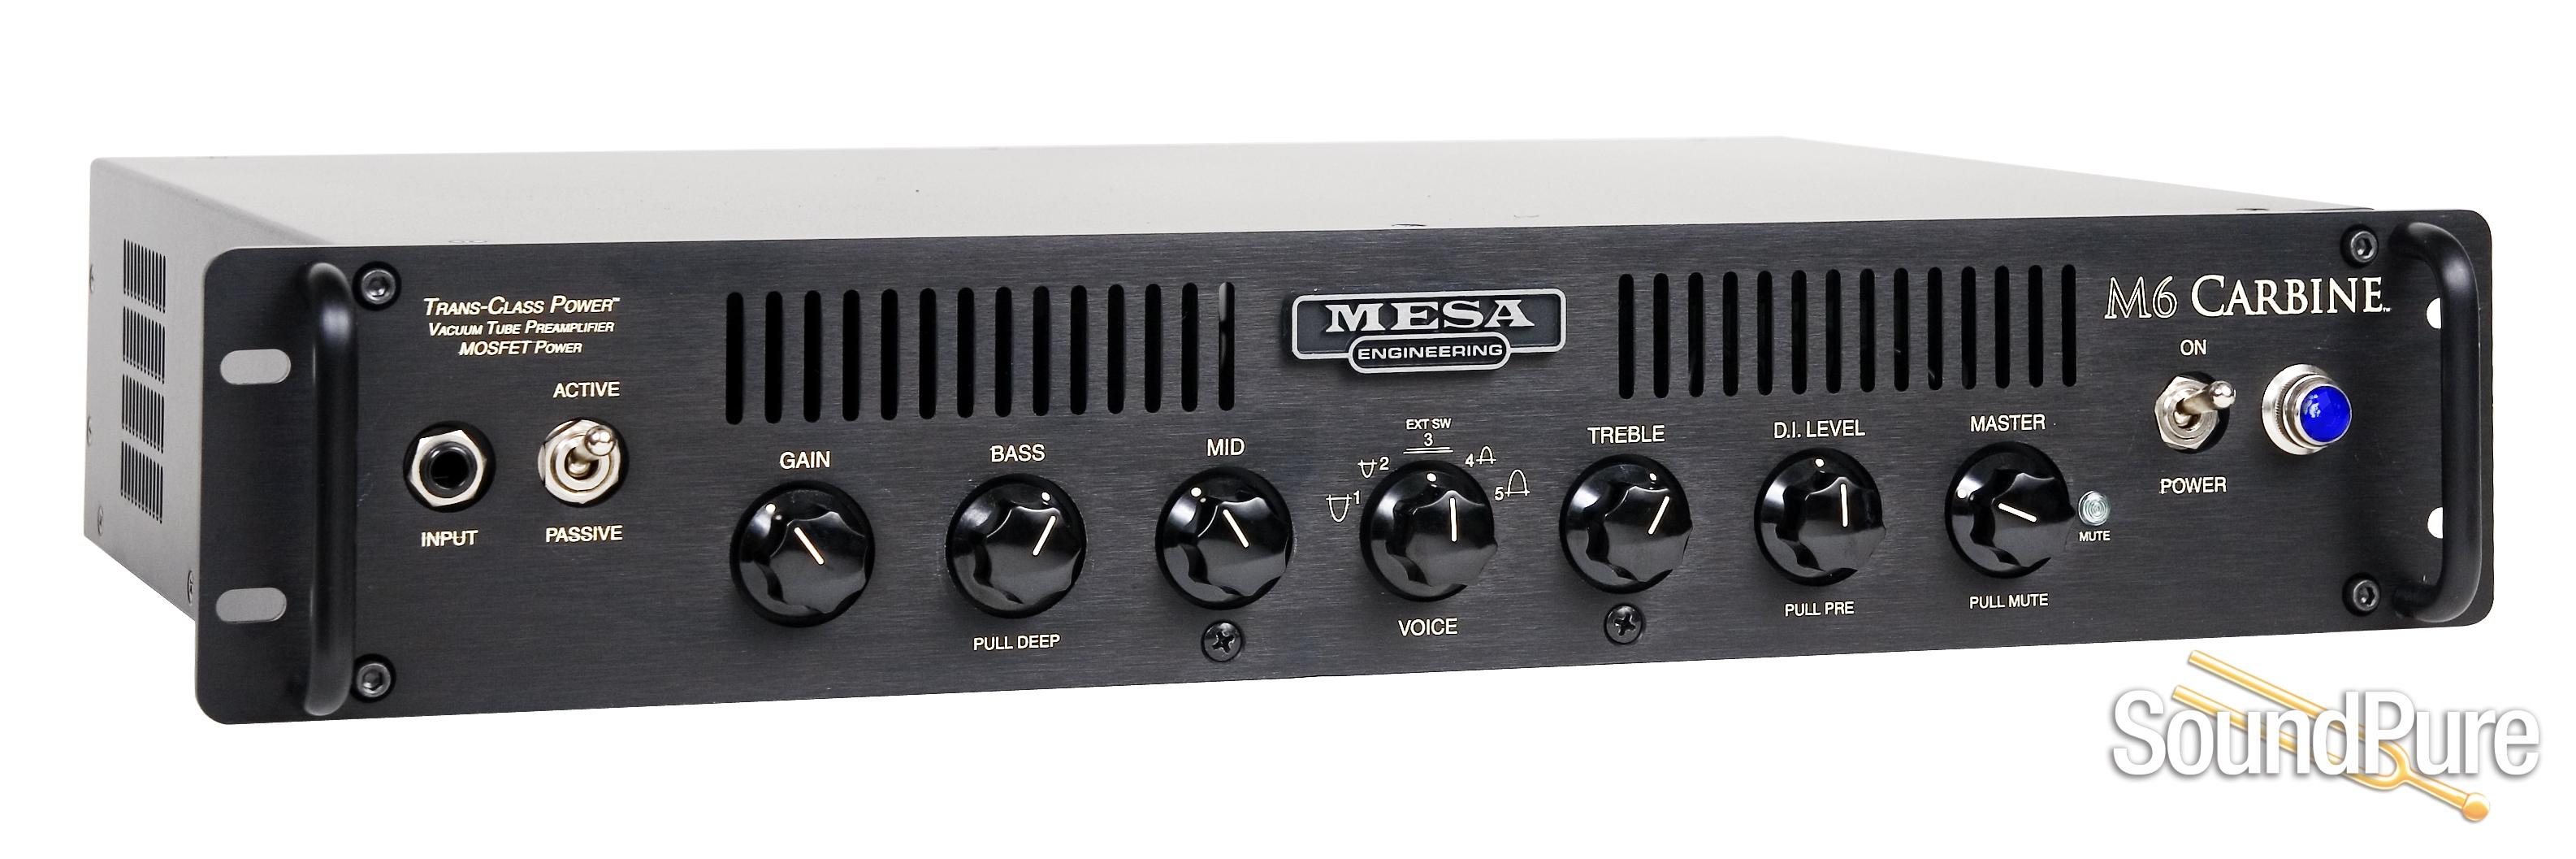 mesa boogie m6 carbine rackmount bass amp. Black Bedroom Furniture Sets. Home Design Ideas